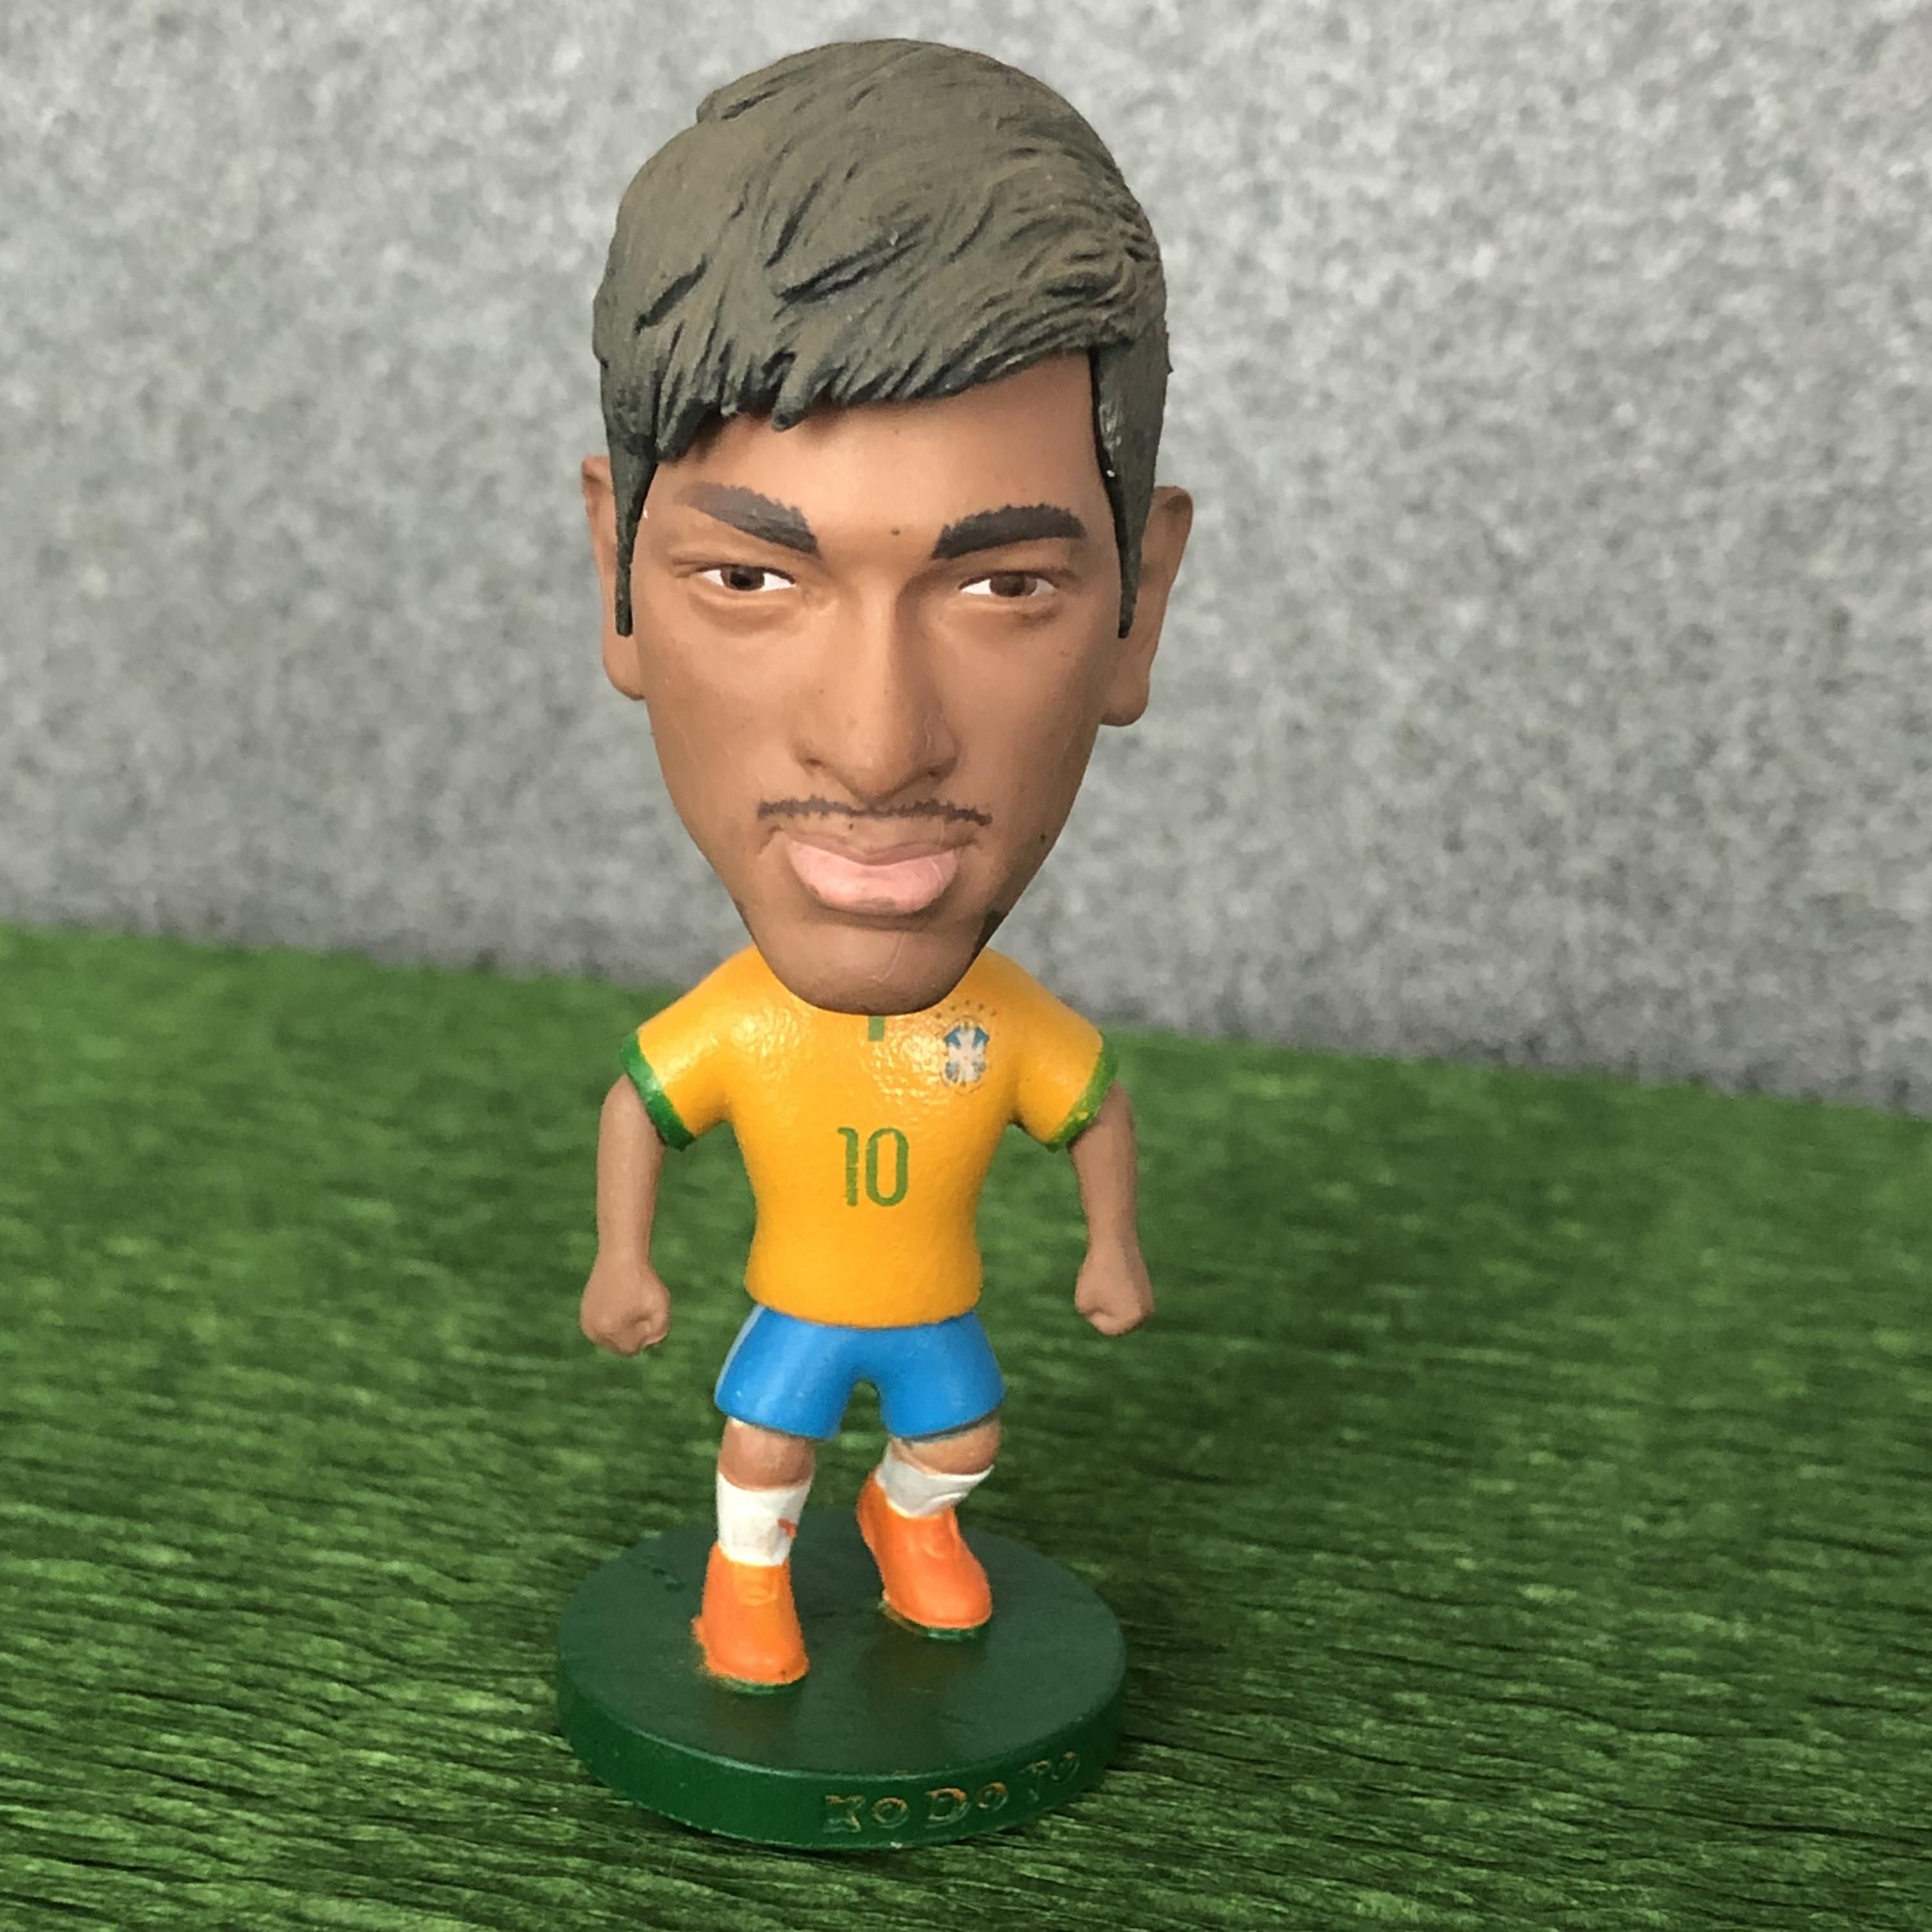 Фигурка звезды мирового футбола неймар